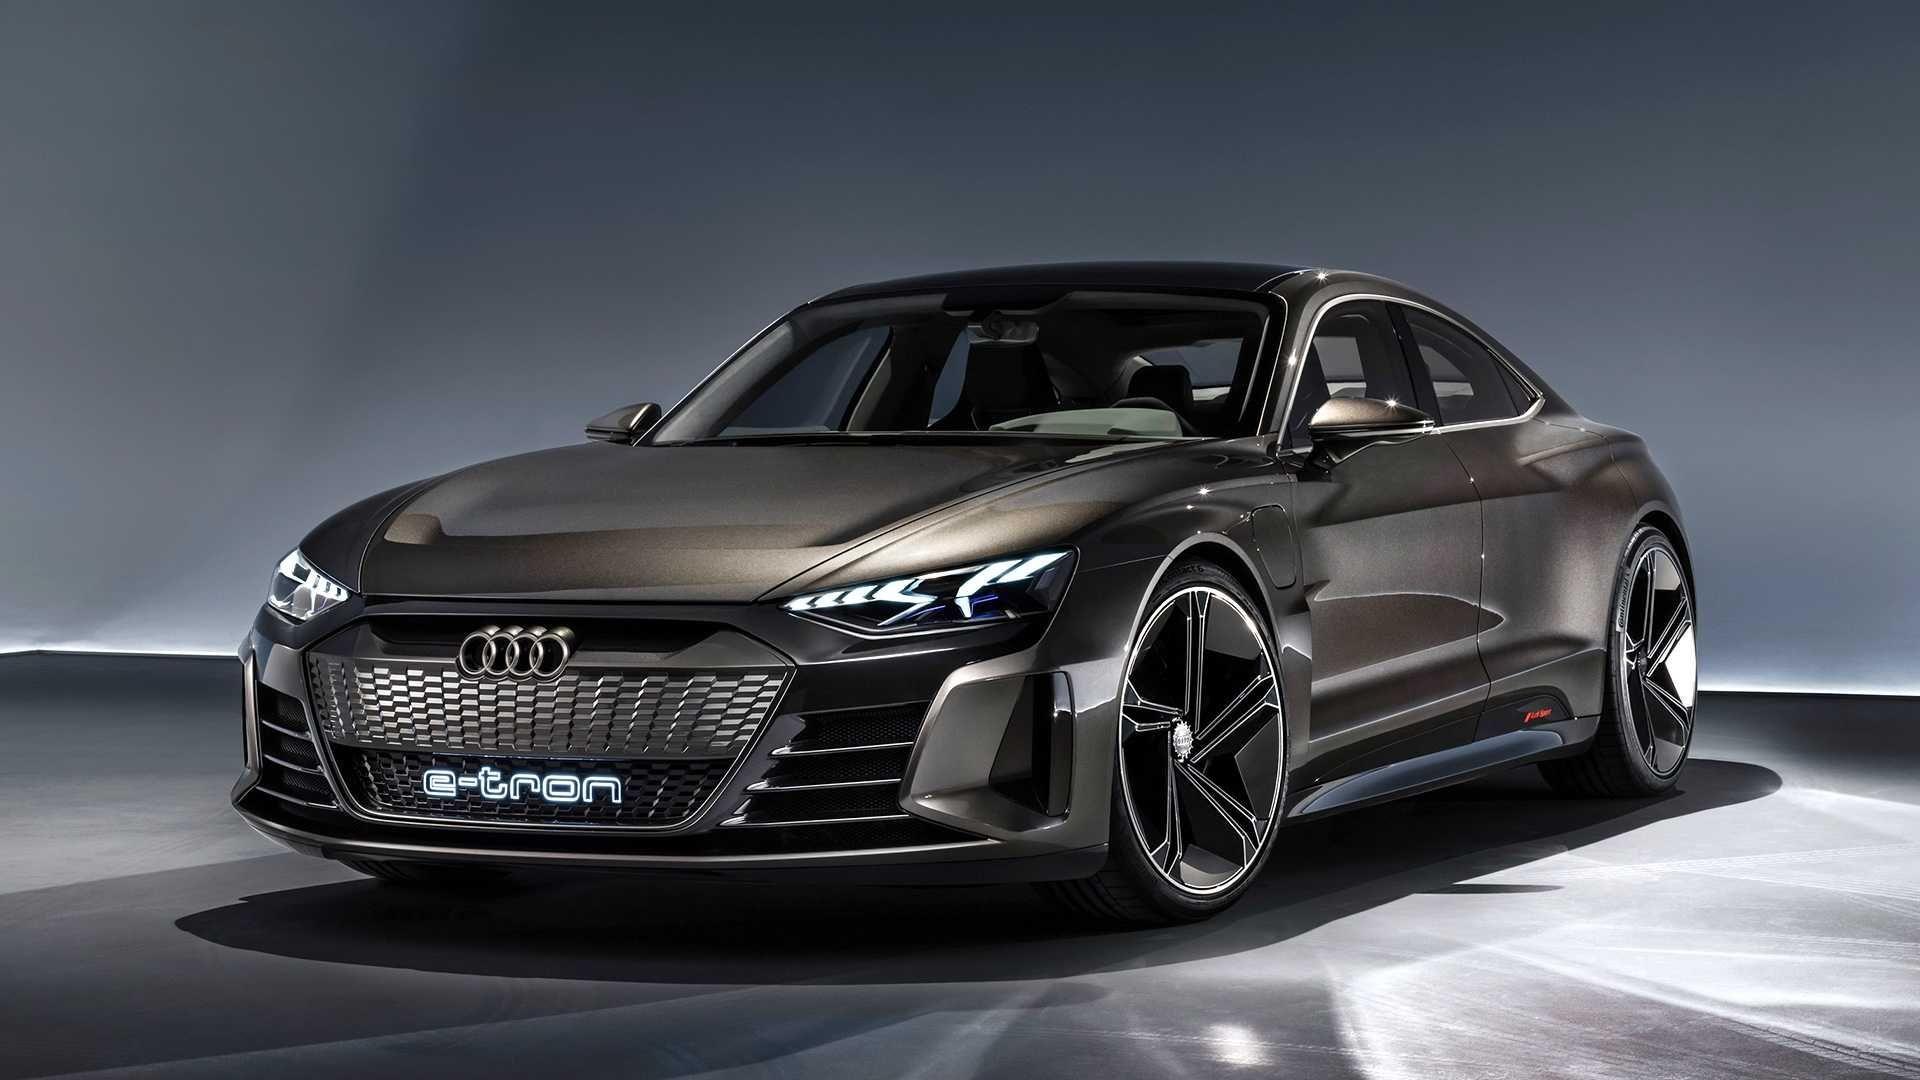 Audi Etron Suv Audi Etron In 2020 Audi E Tron E Tron Audi